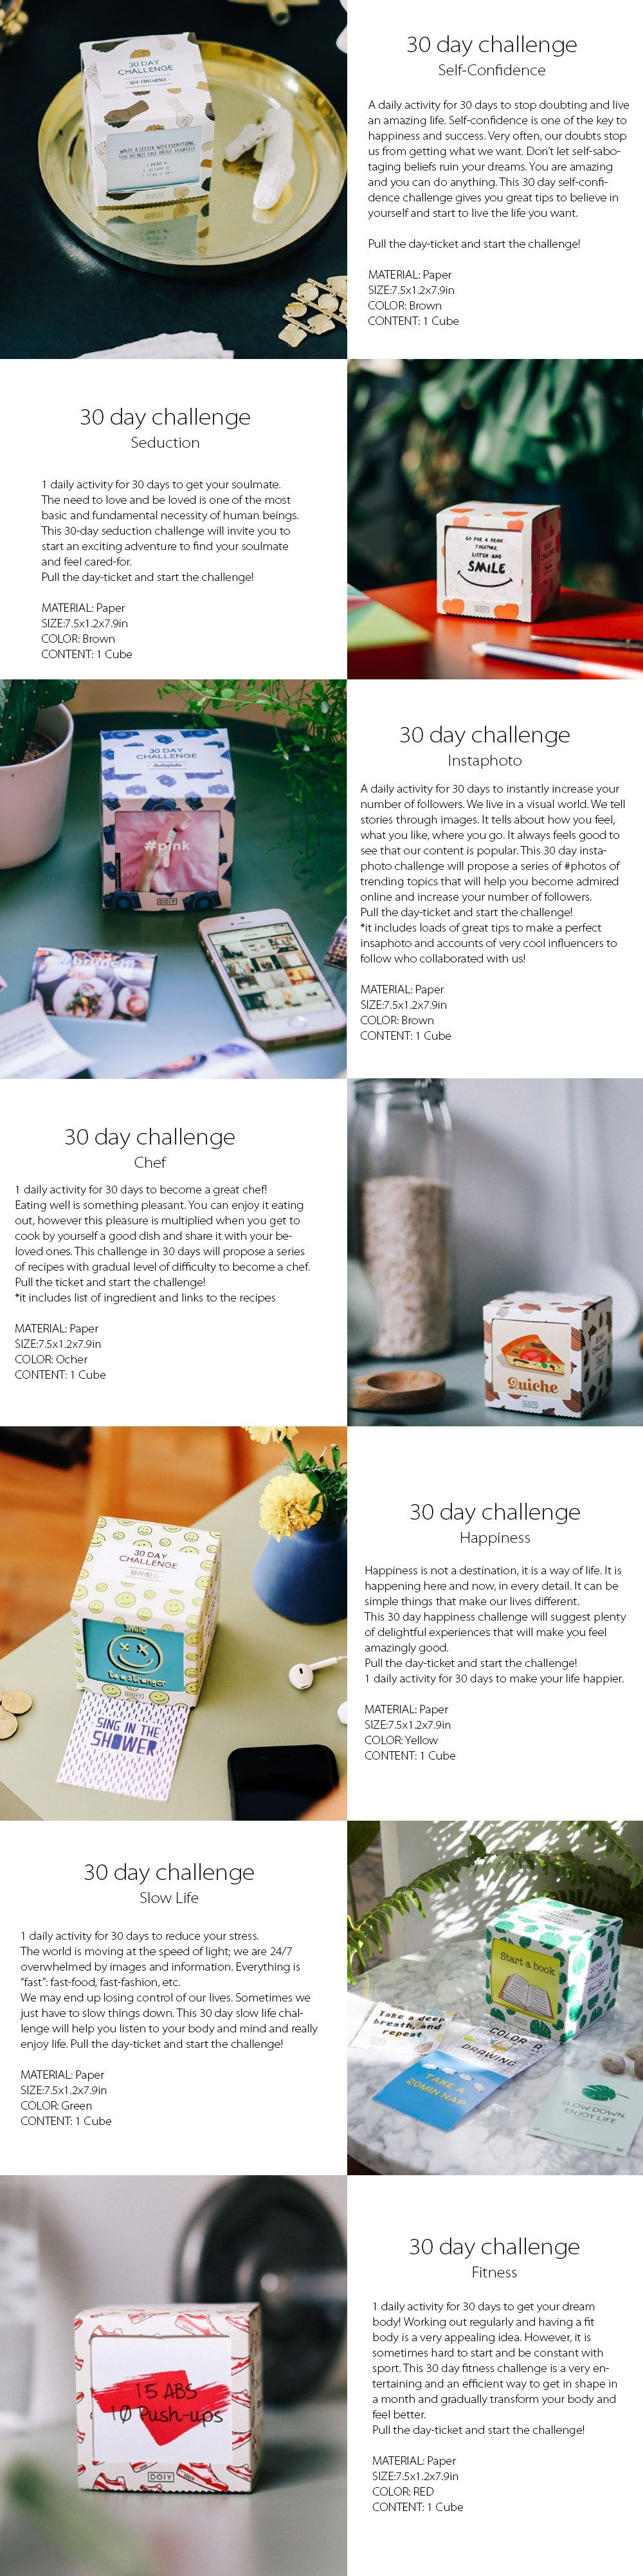 30 Day Challenge A Fun Self Challenge